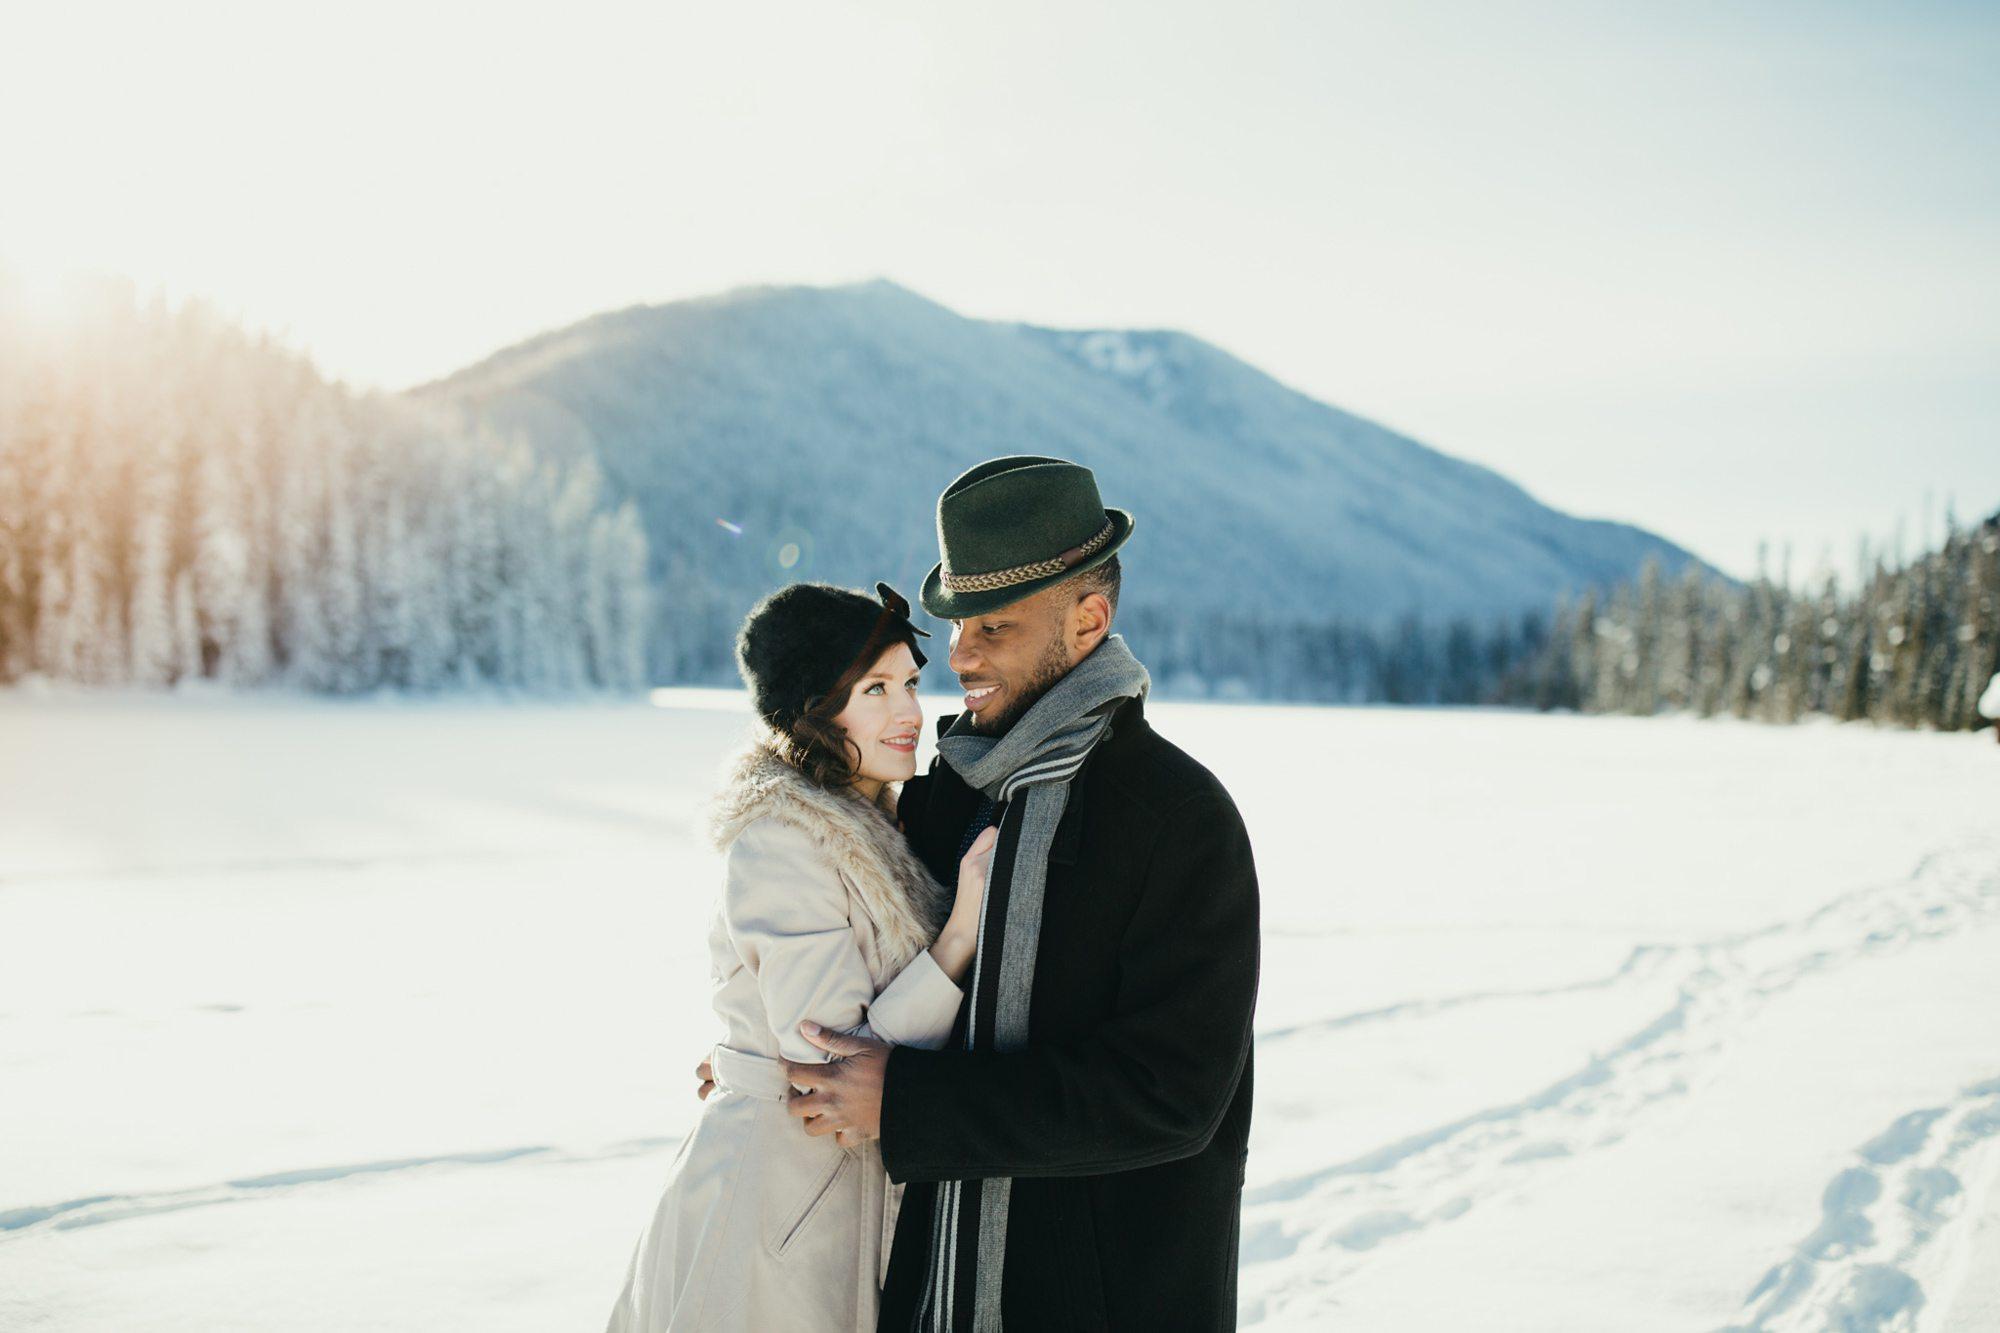 012-adventure-engagement-photographer